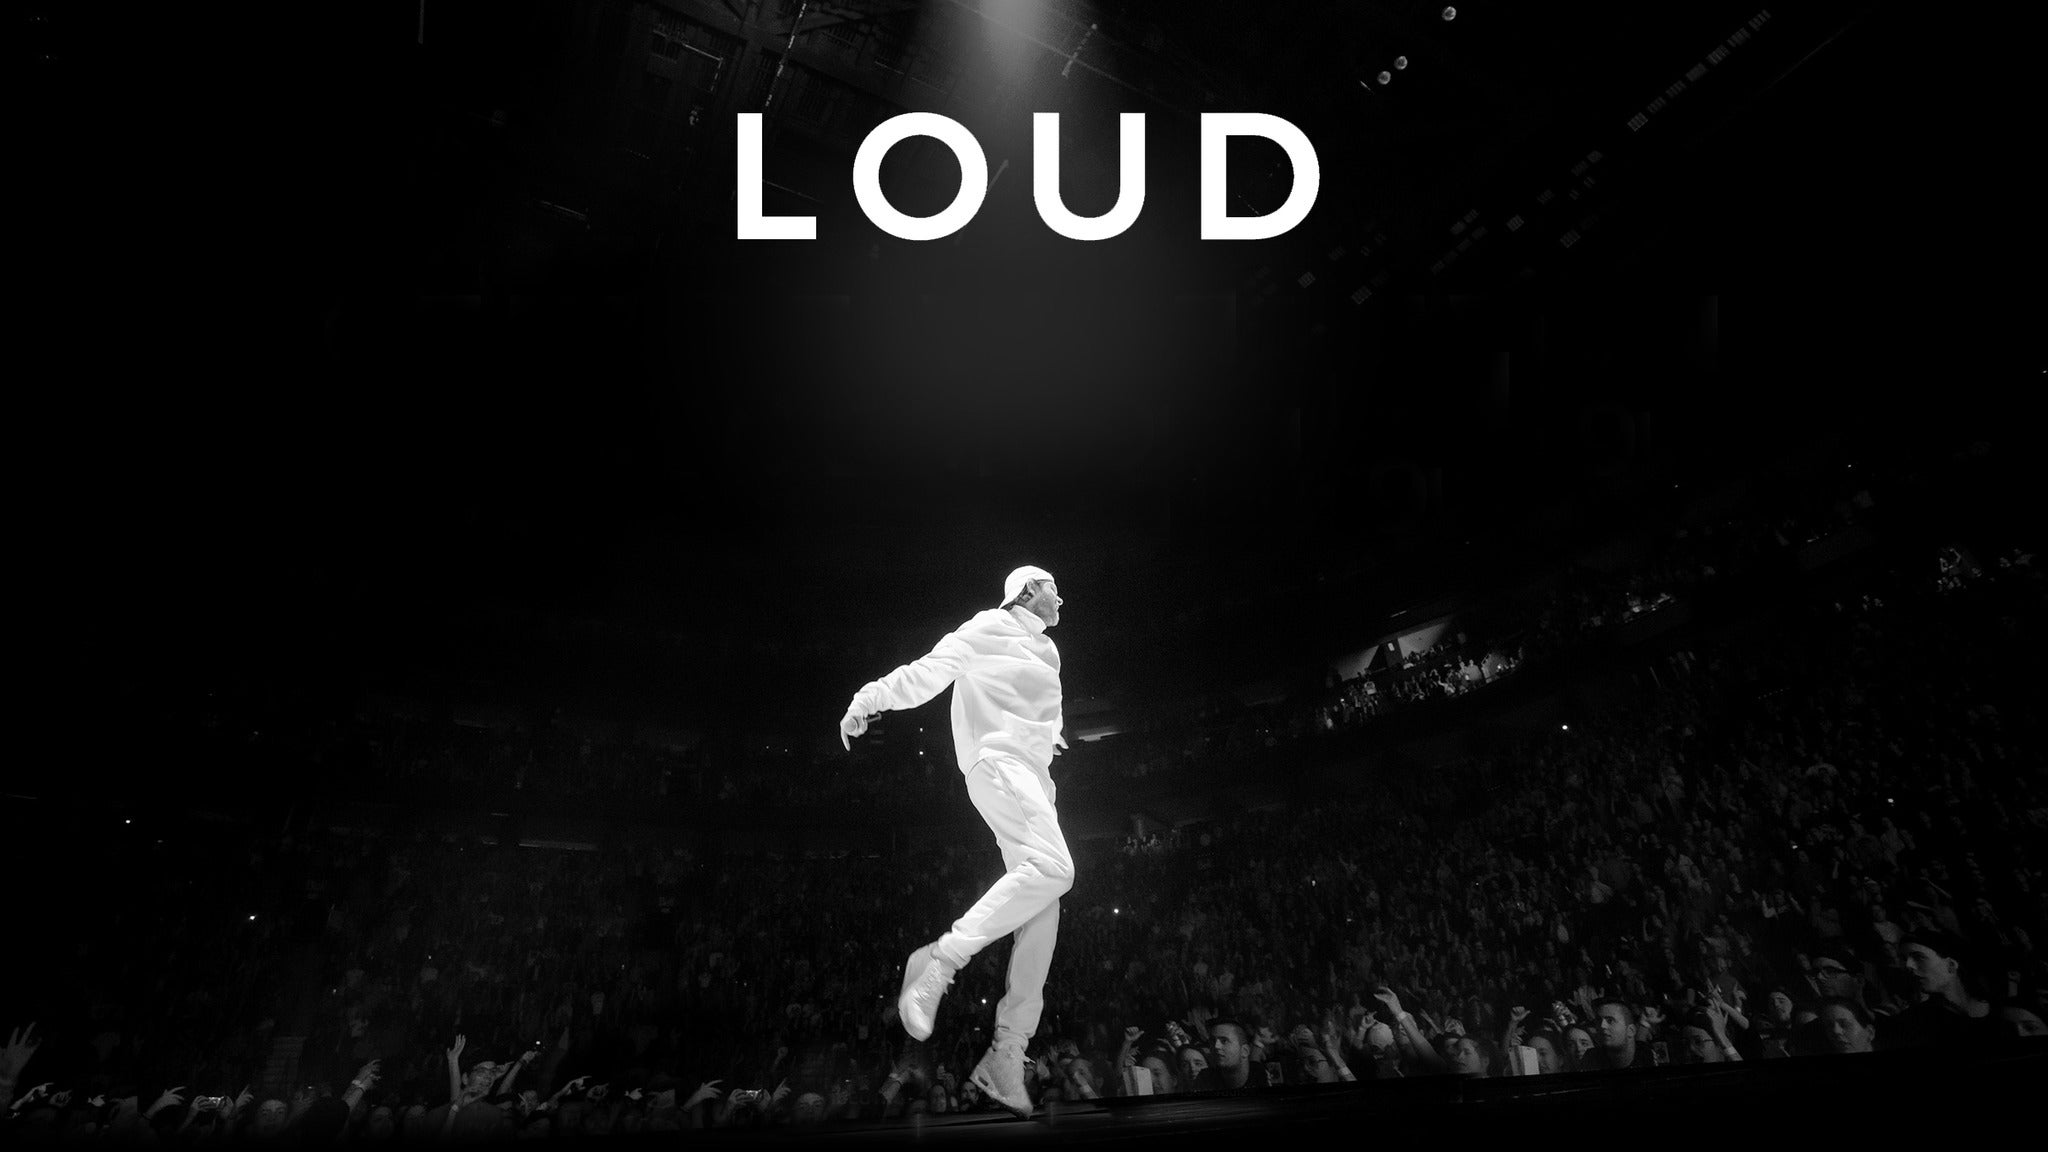 Loud tickets (Copyright © Ticketmaster)